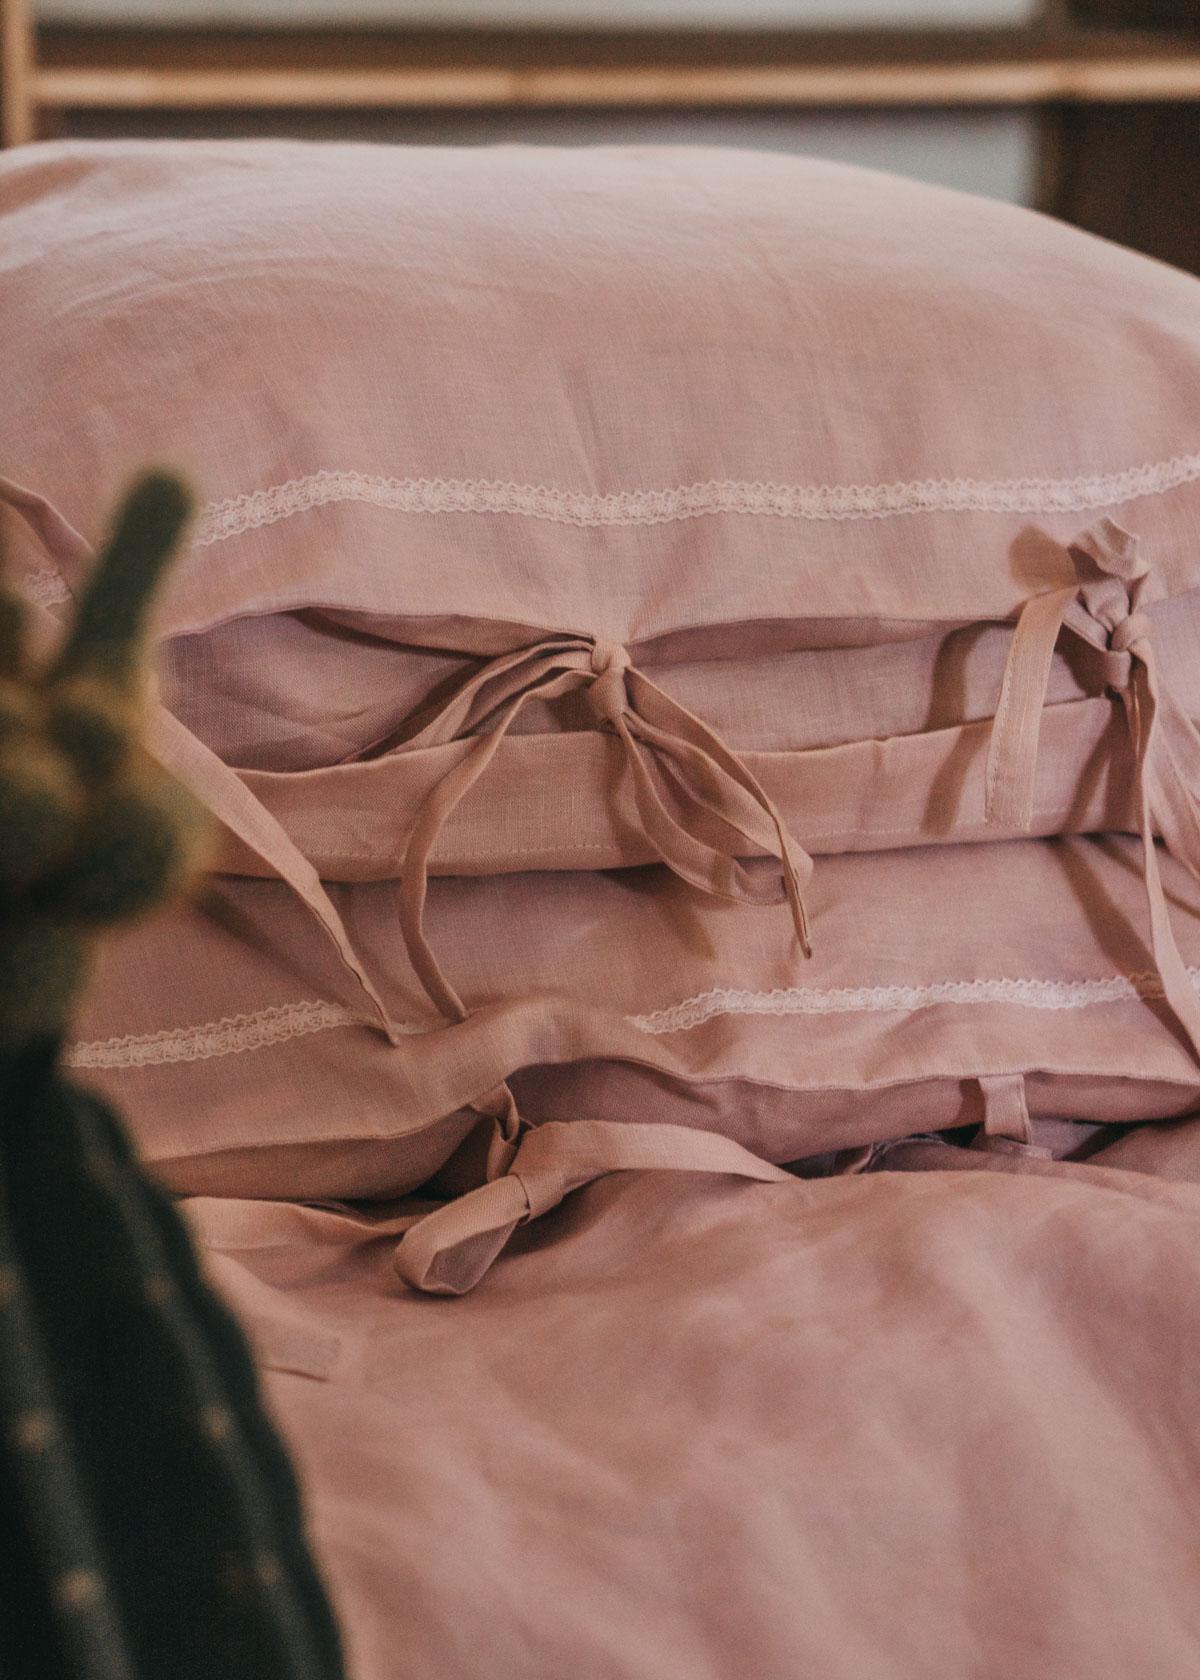 Keira-Mason-in-between-the-sheets-linen-bows.jpg